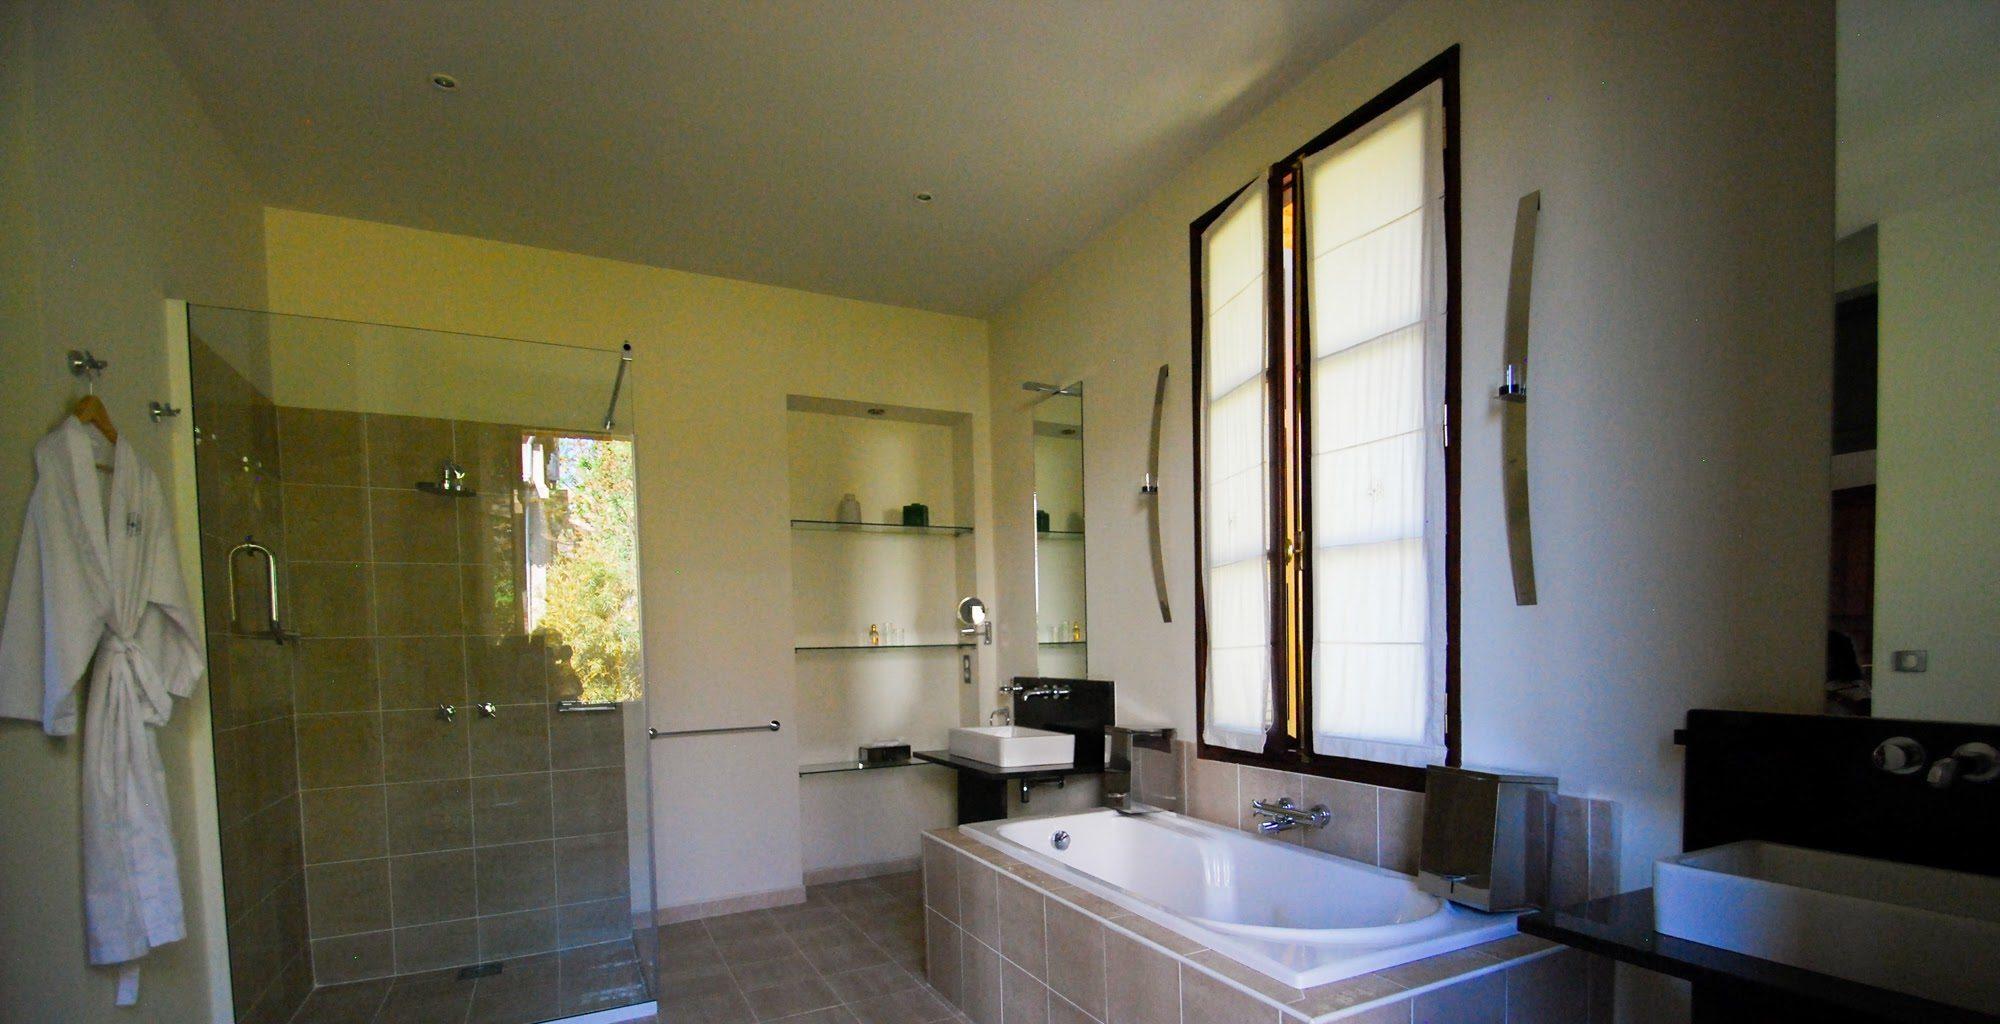 Maison Gallieni Madagascar Bathroom